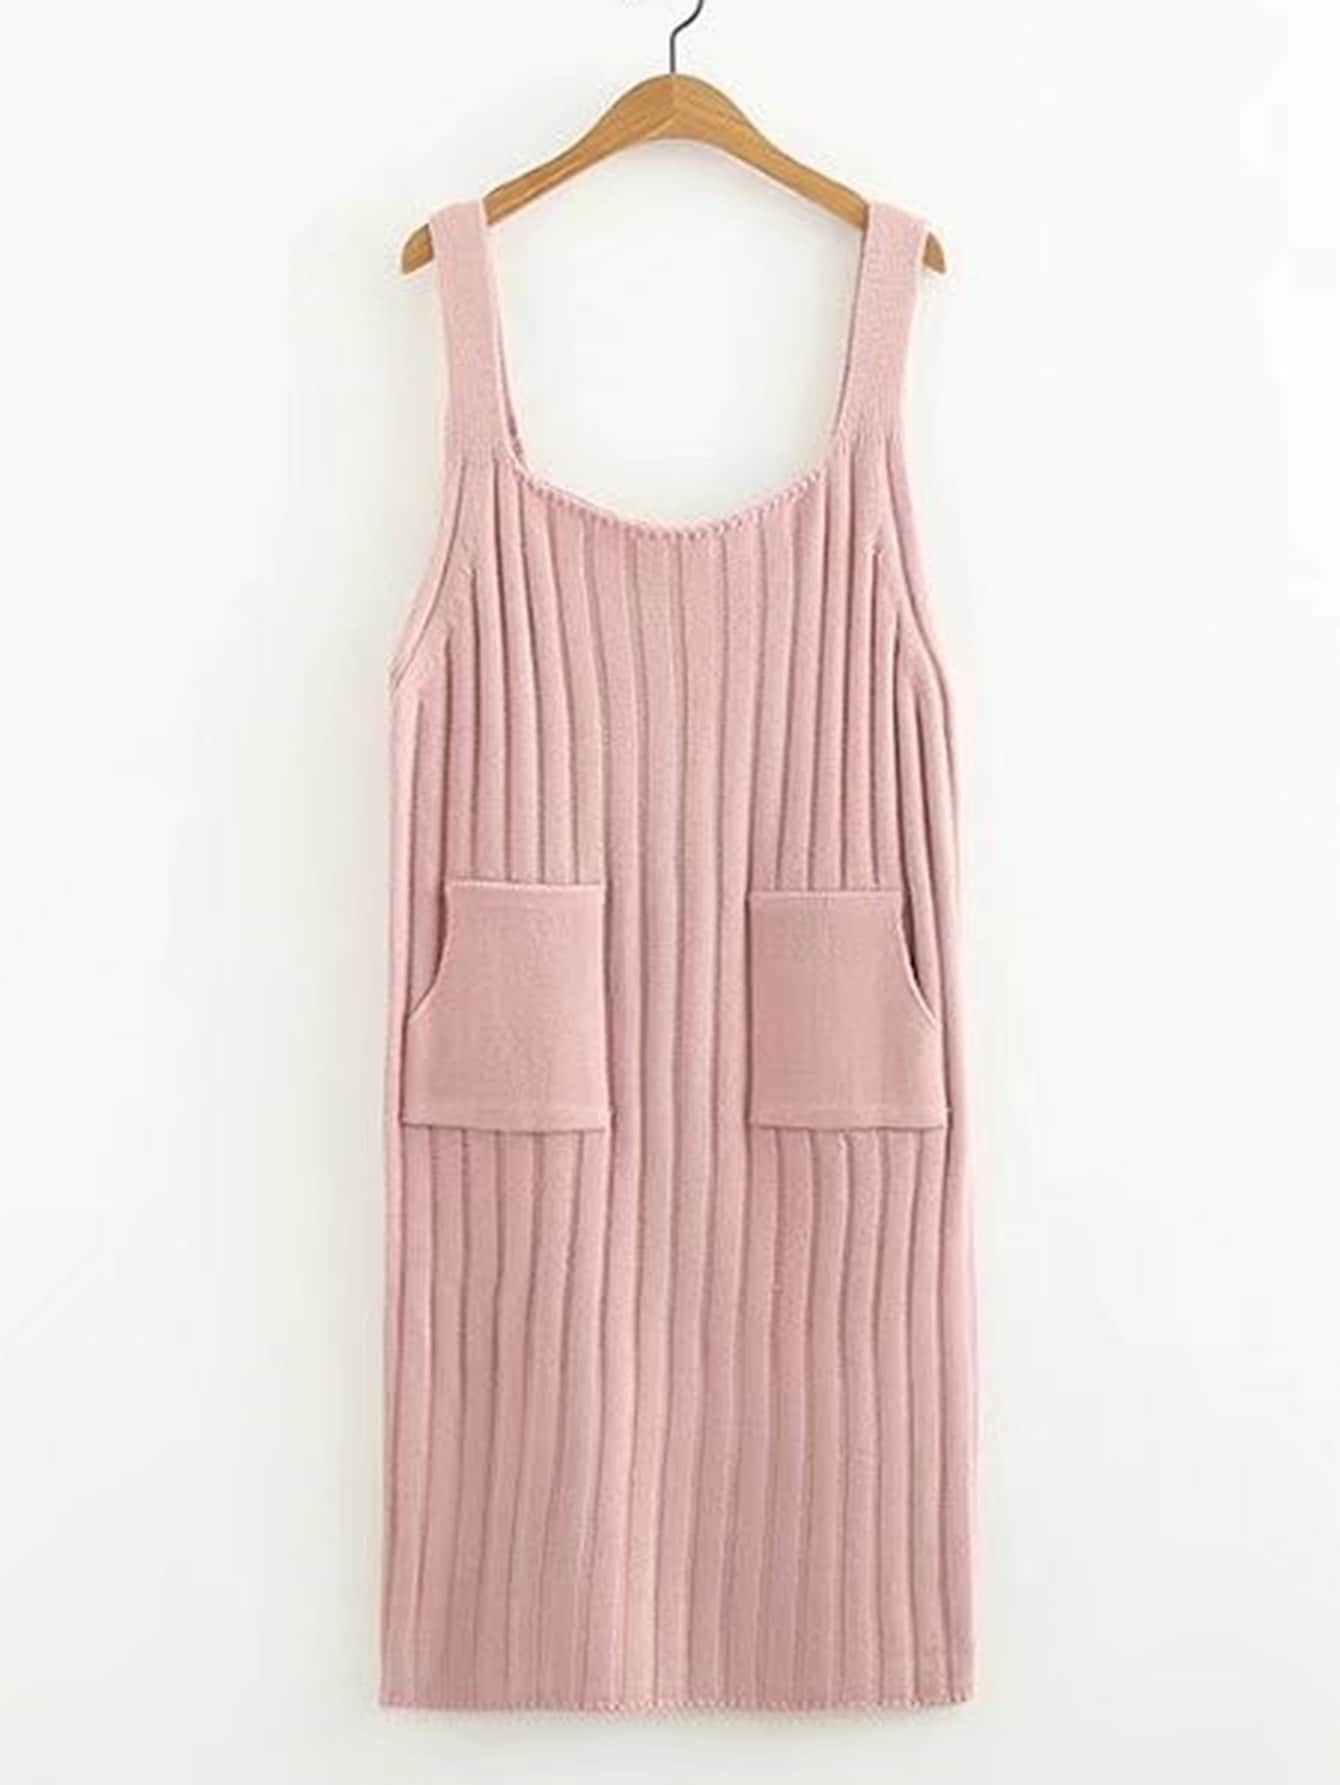 Wide Strap Ribbed Knit Dress rdre170922204